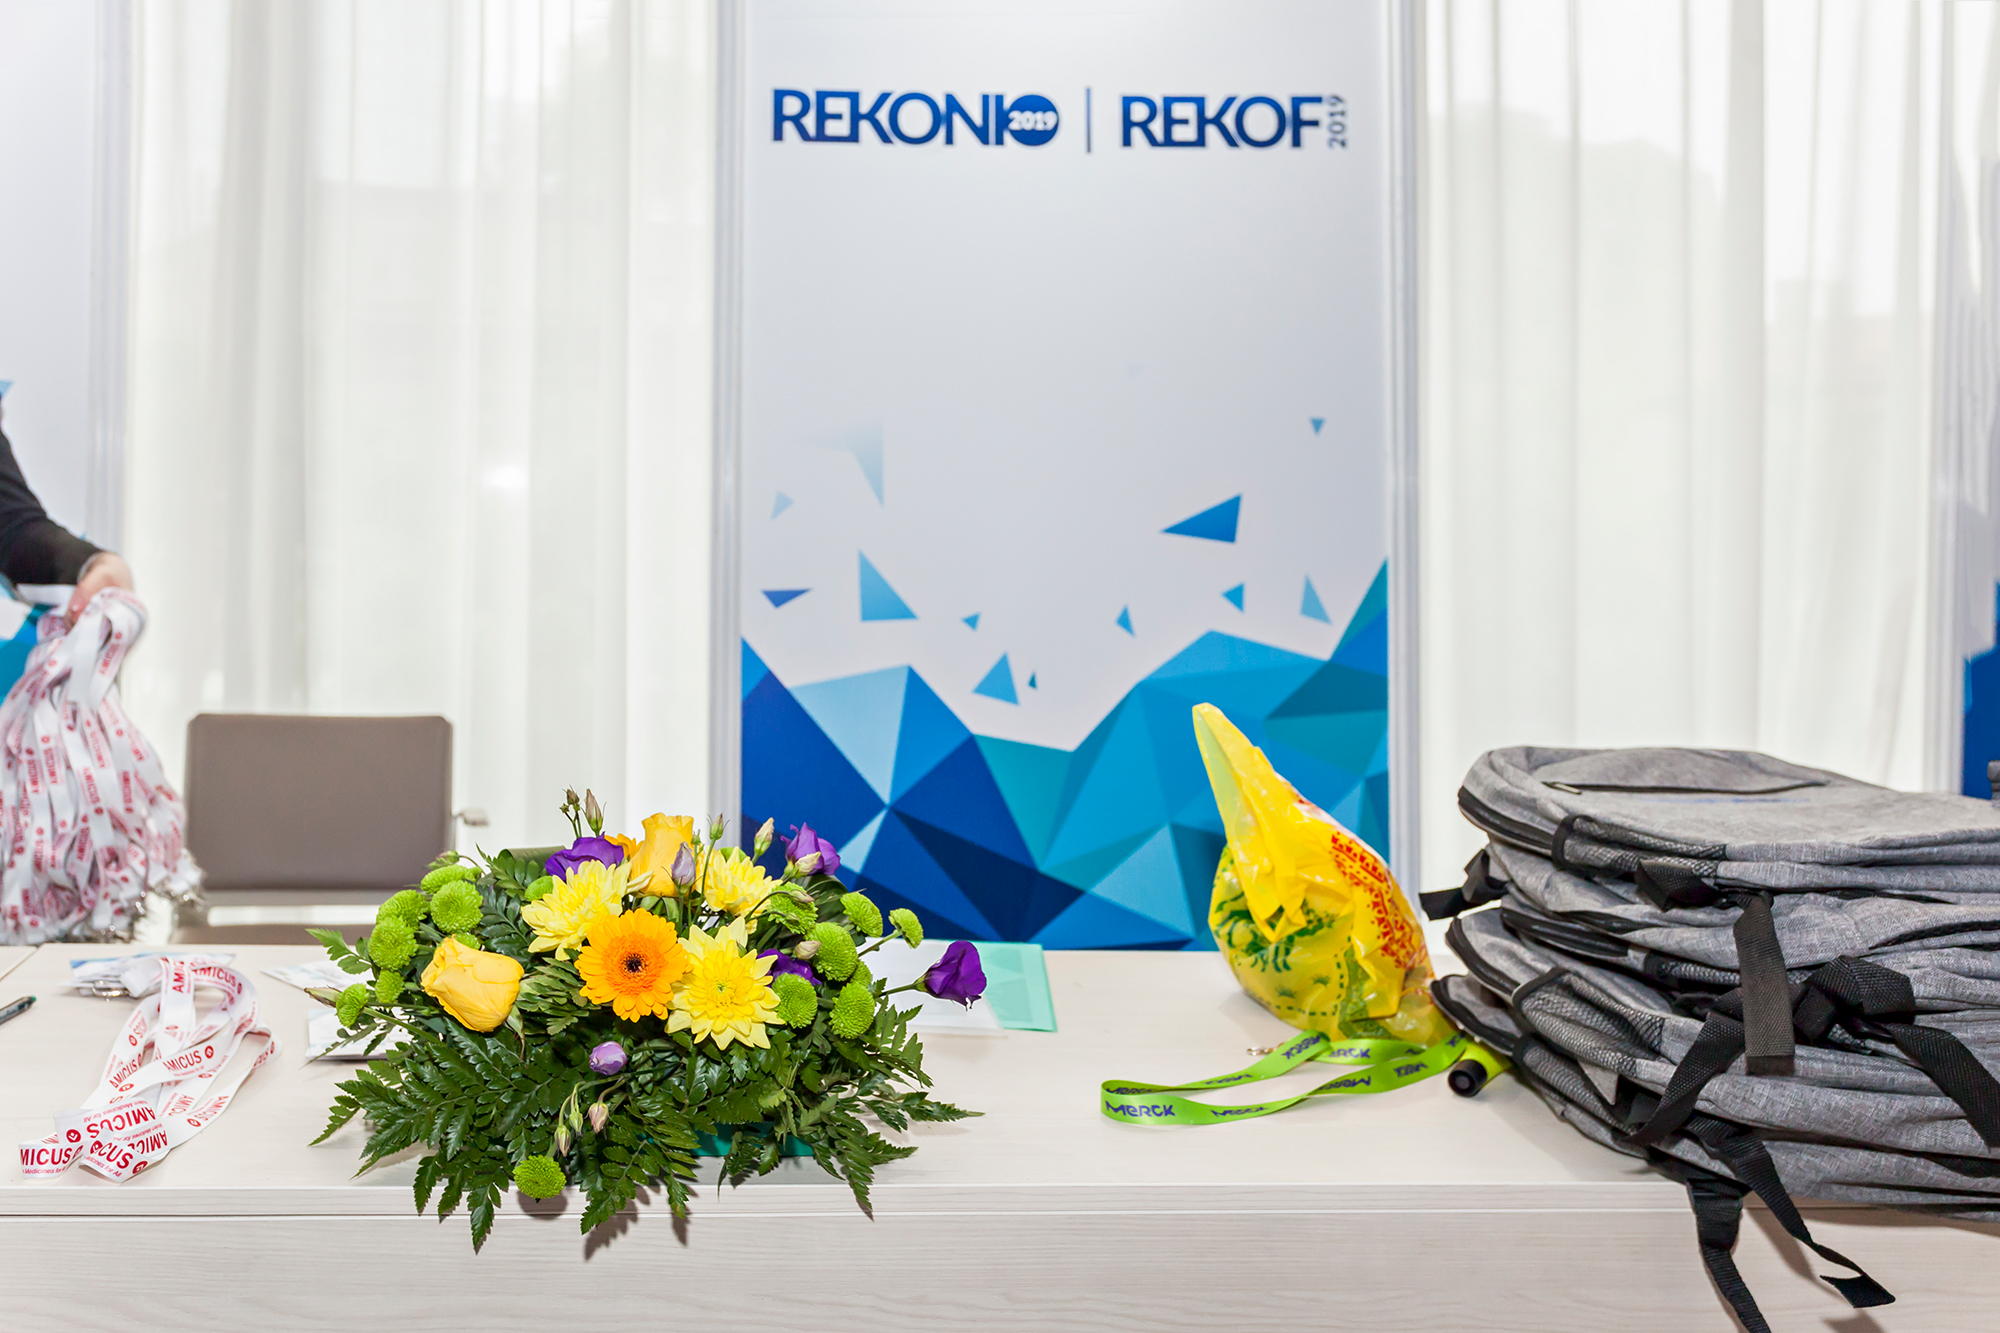 REKONIO&REKOF2019_byMiri_022